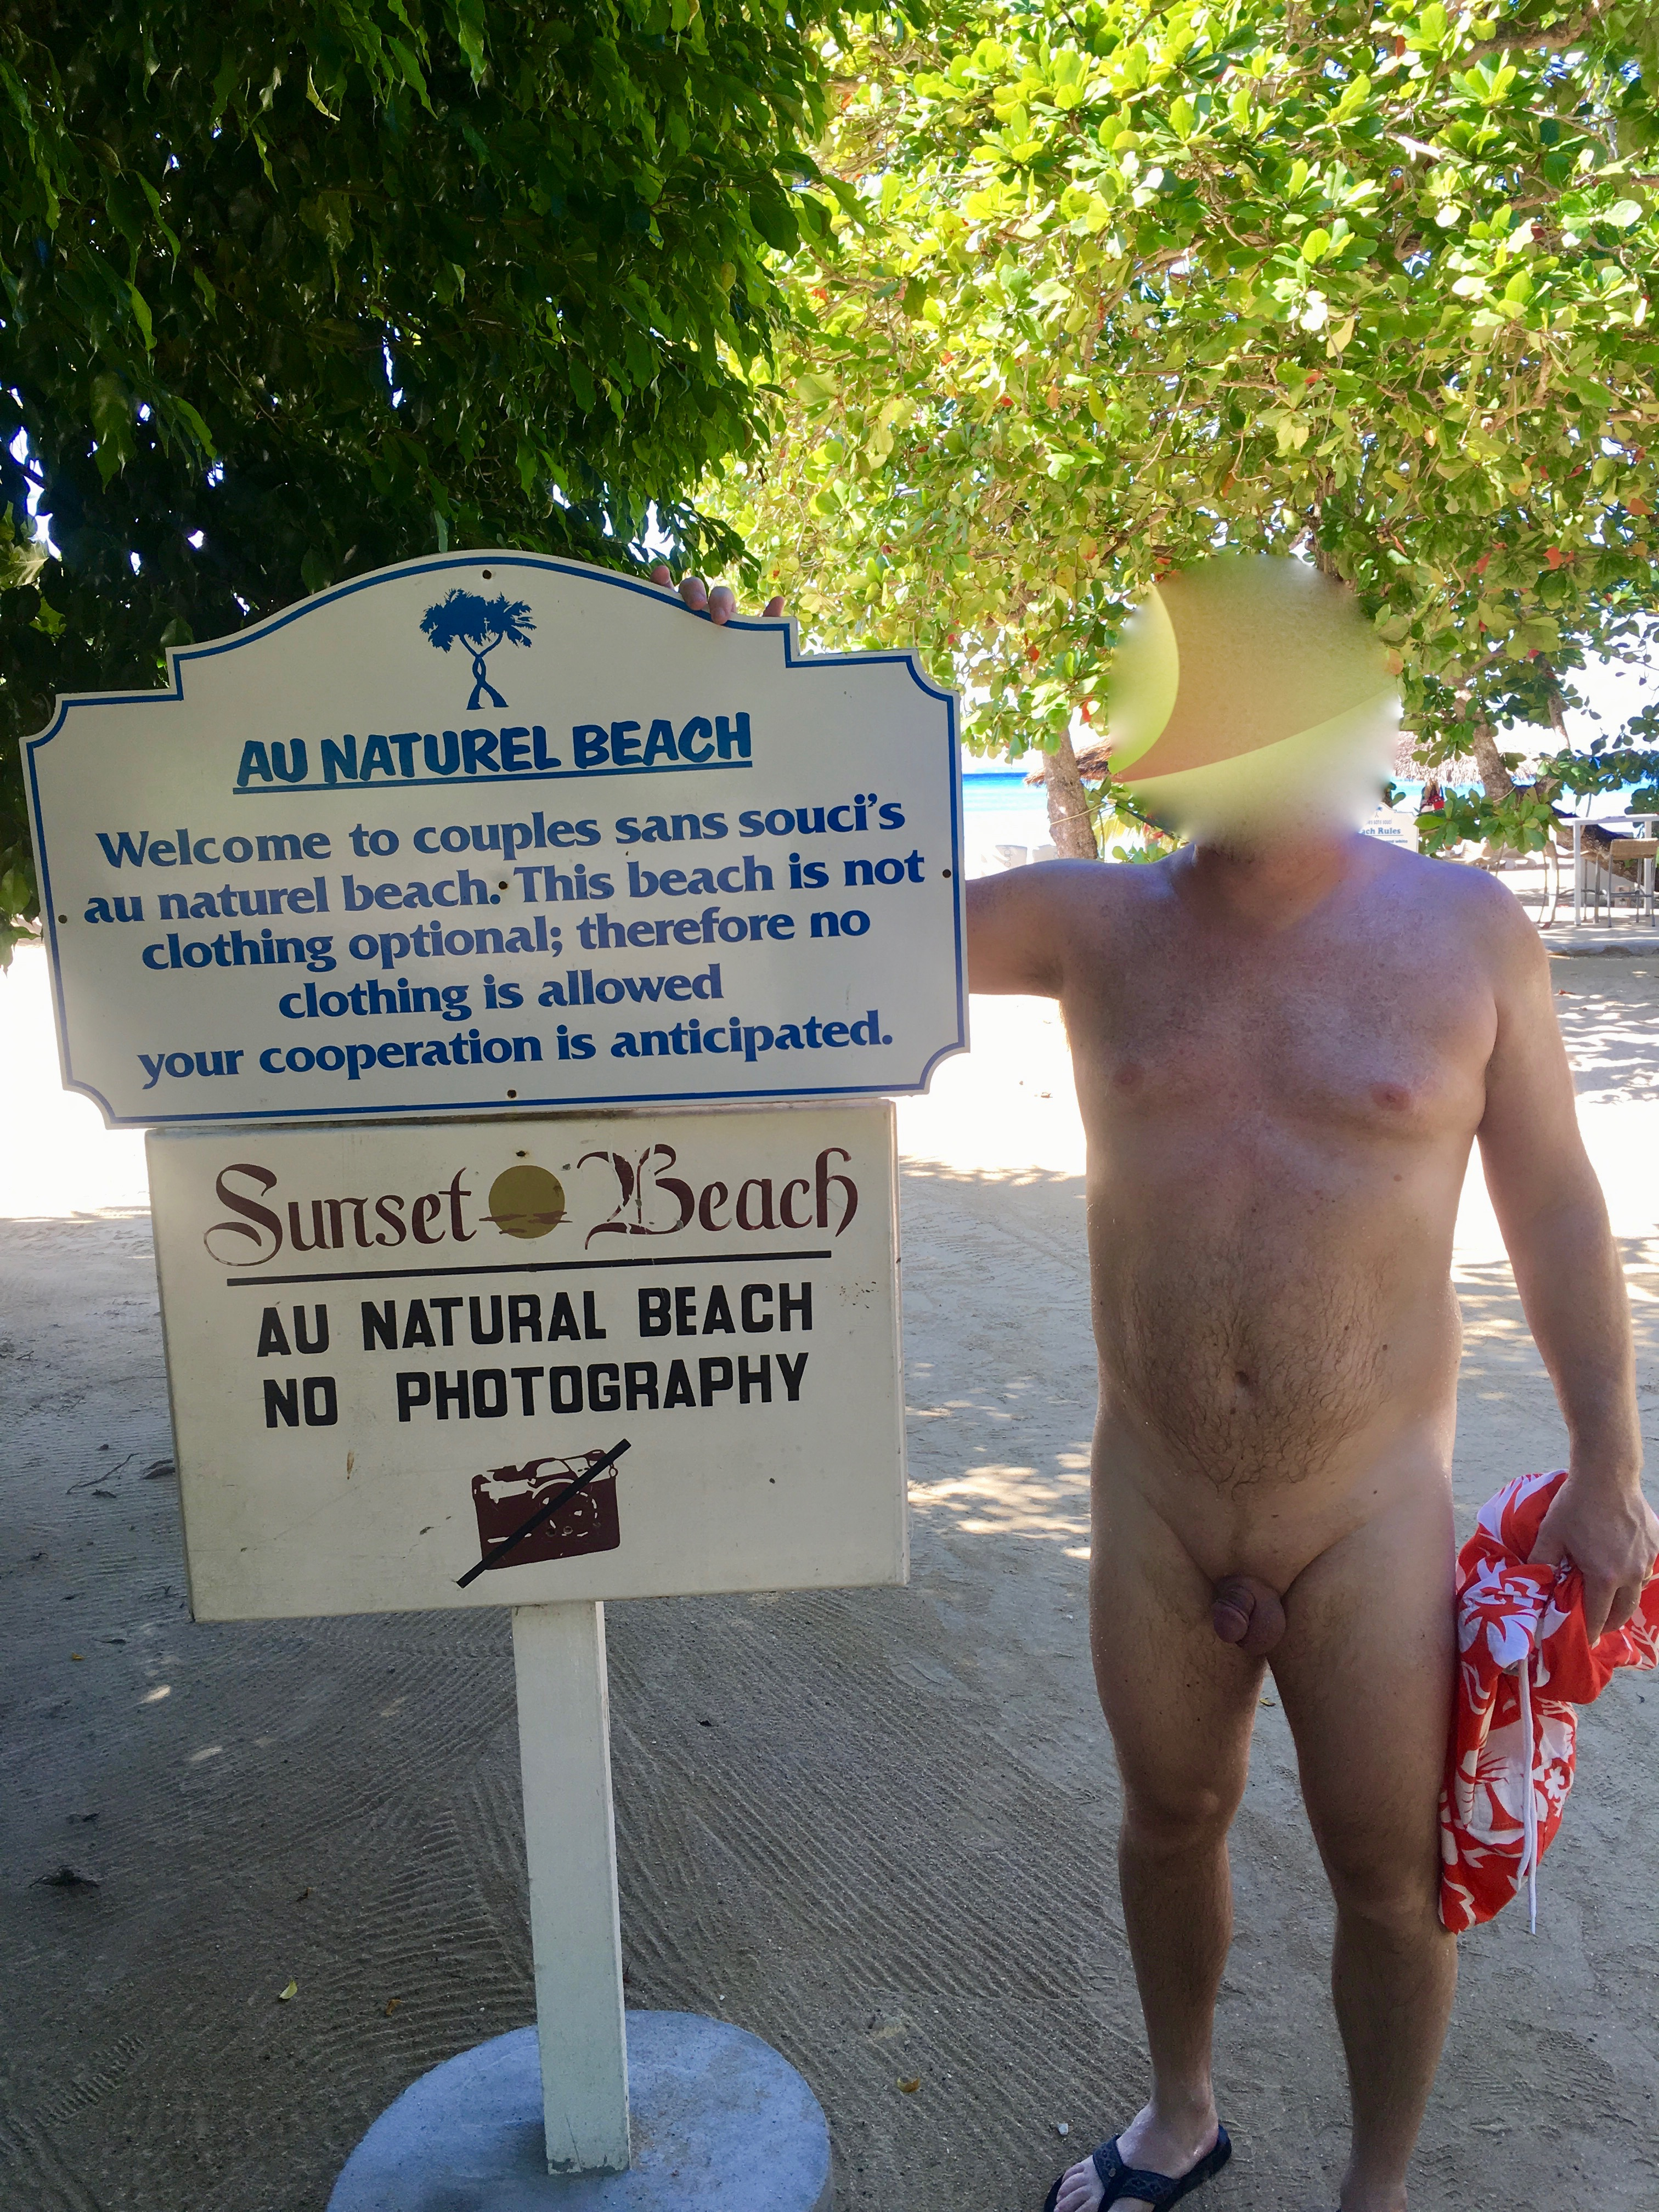 couples san souci nude beach